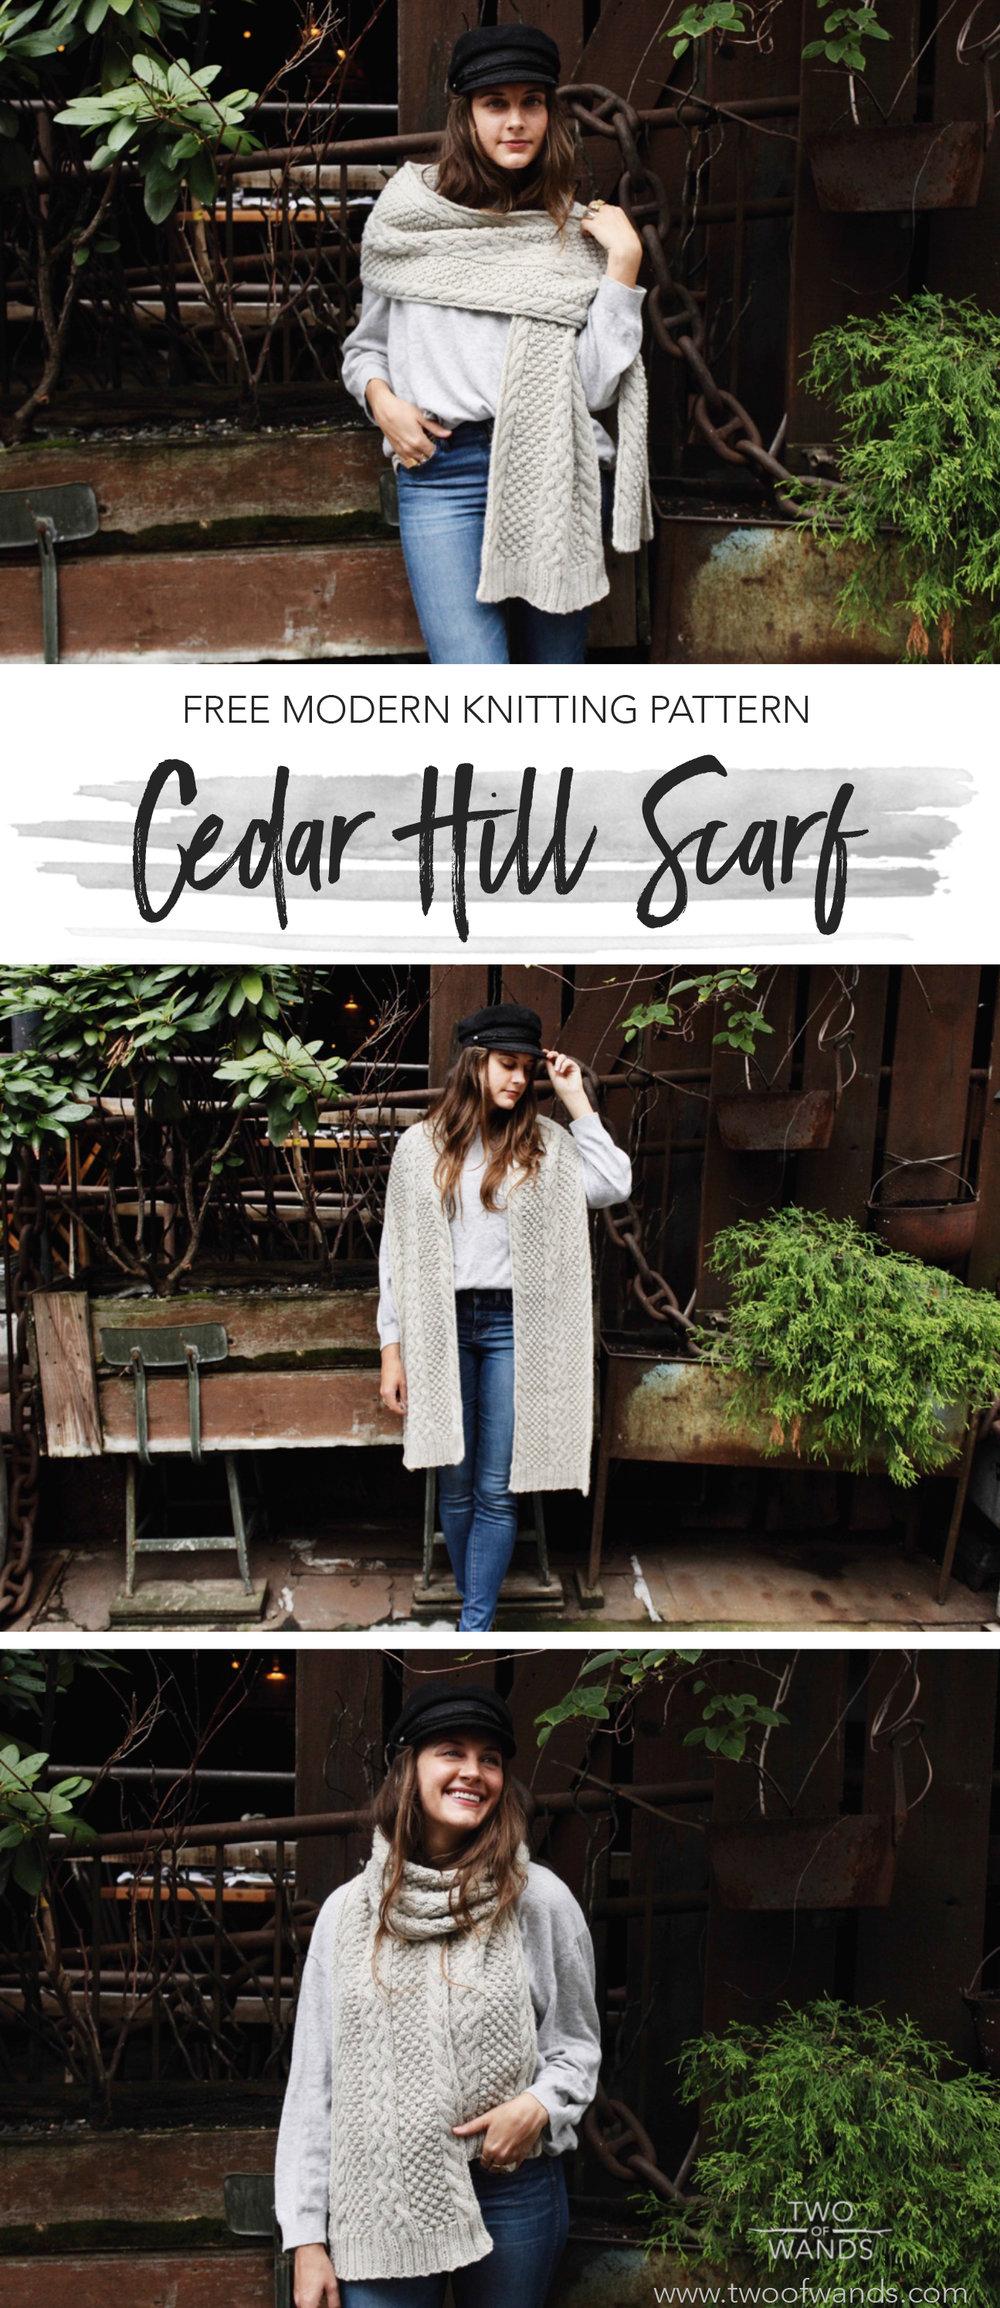 Cedar Hill Scarf pattern by Two of Wands